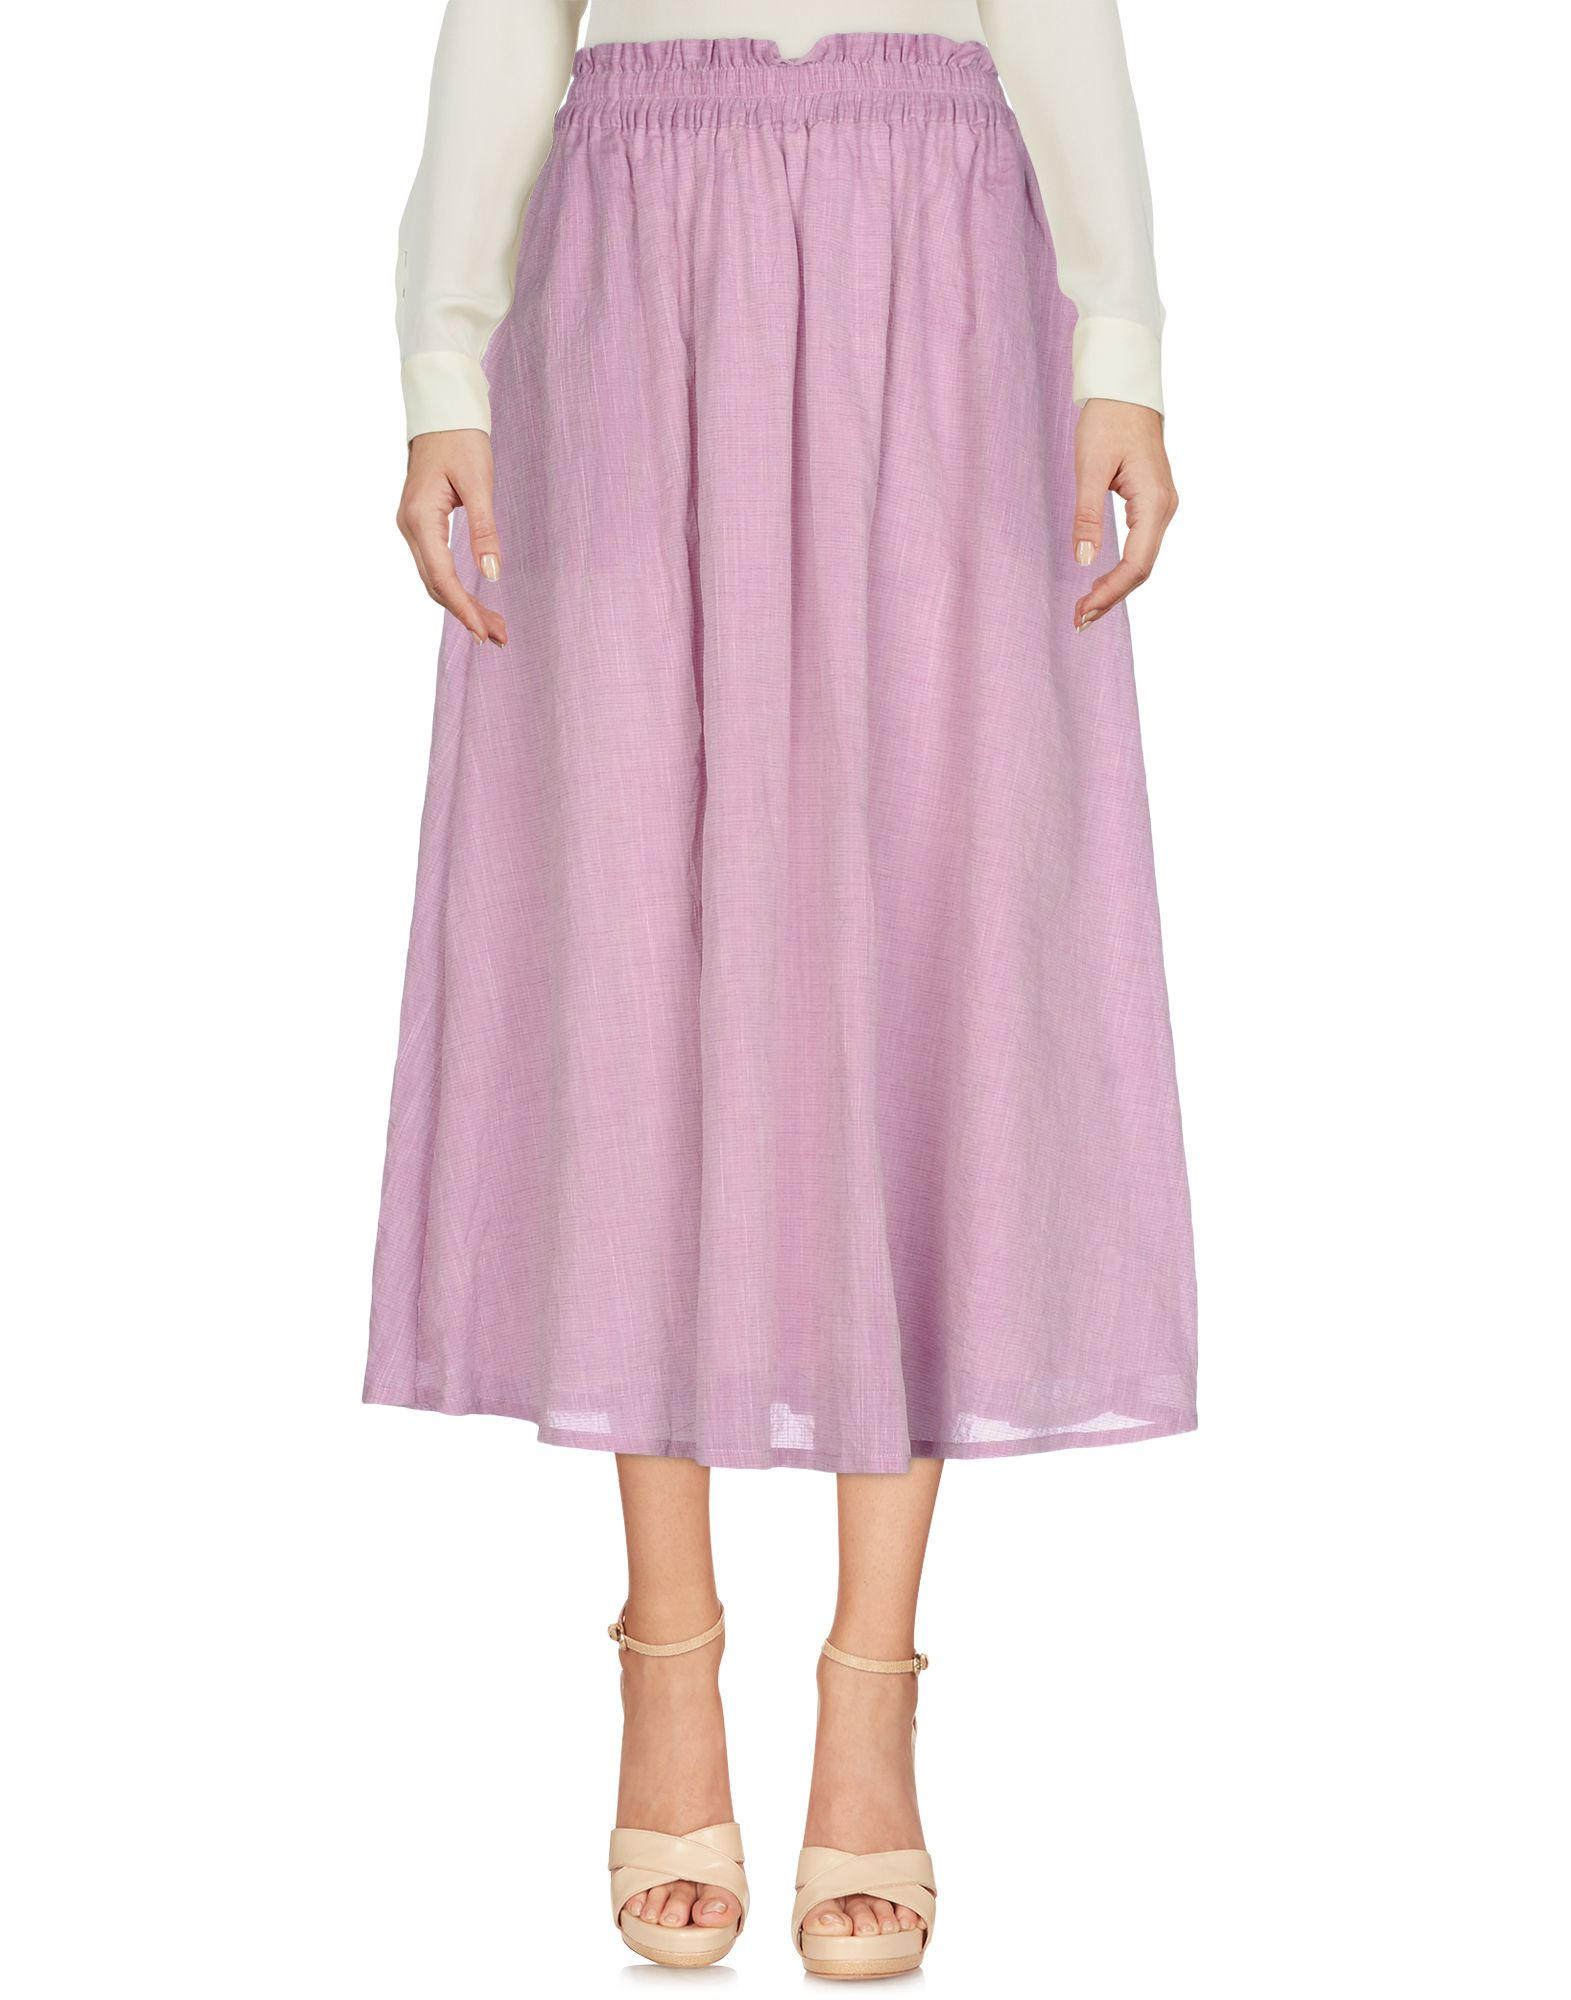 RENLI SU Midi Skirts in Light Purple